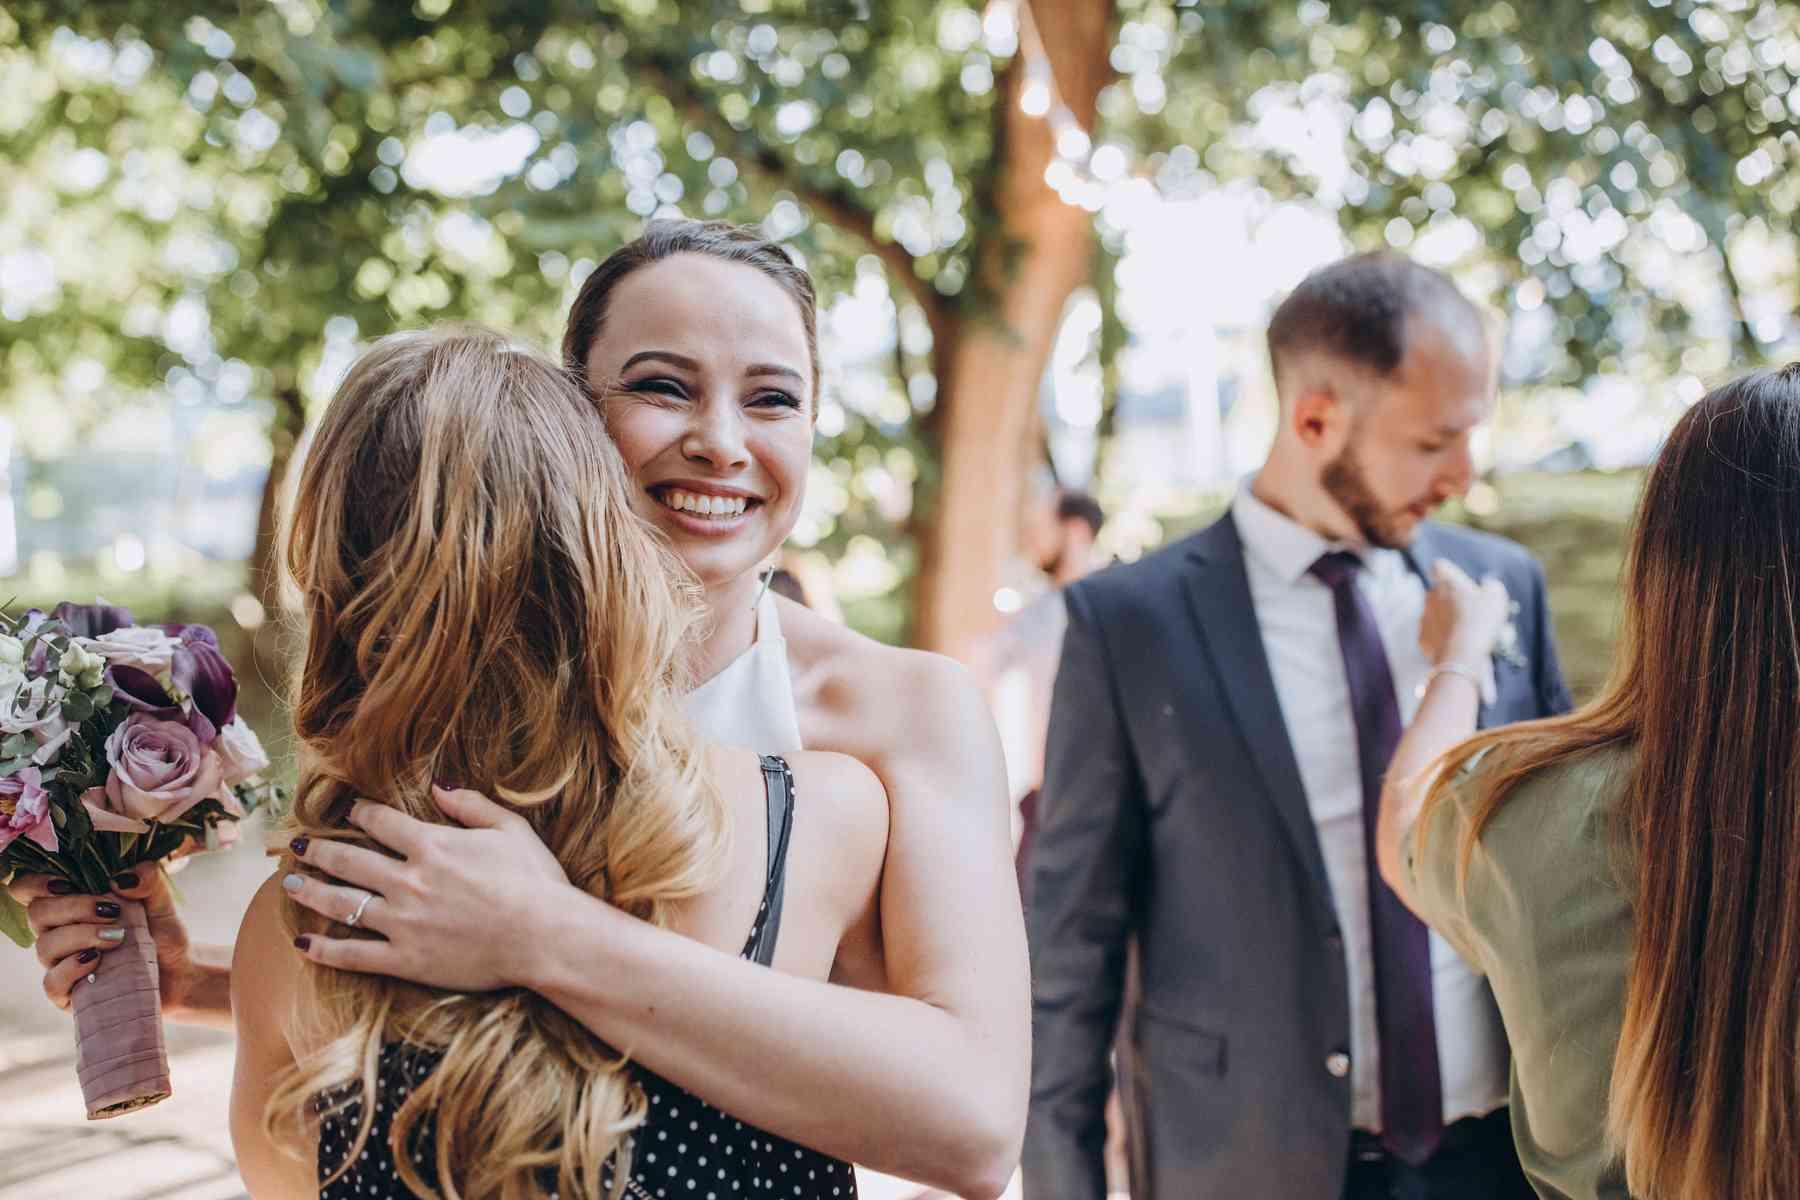 поздравления молодоженов на свадьбе